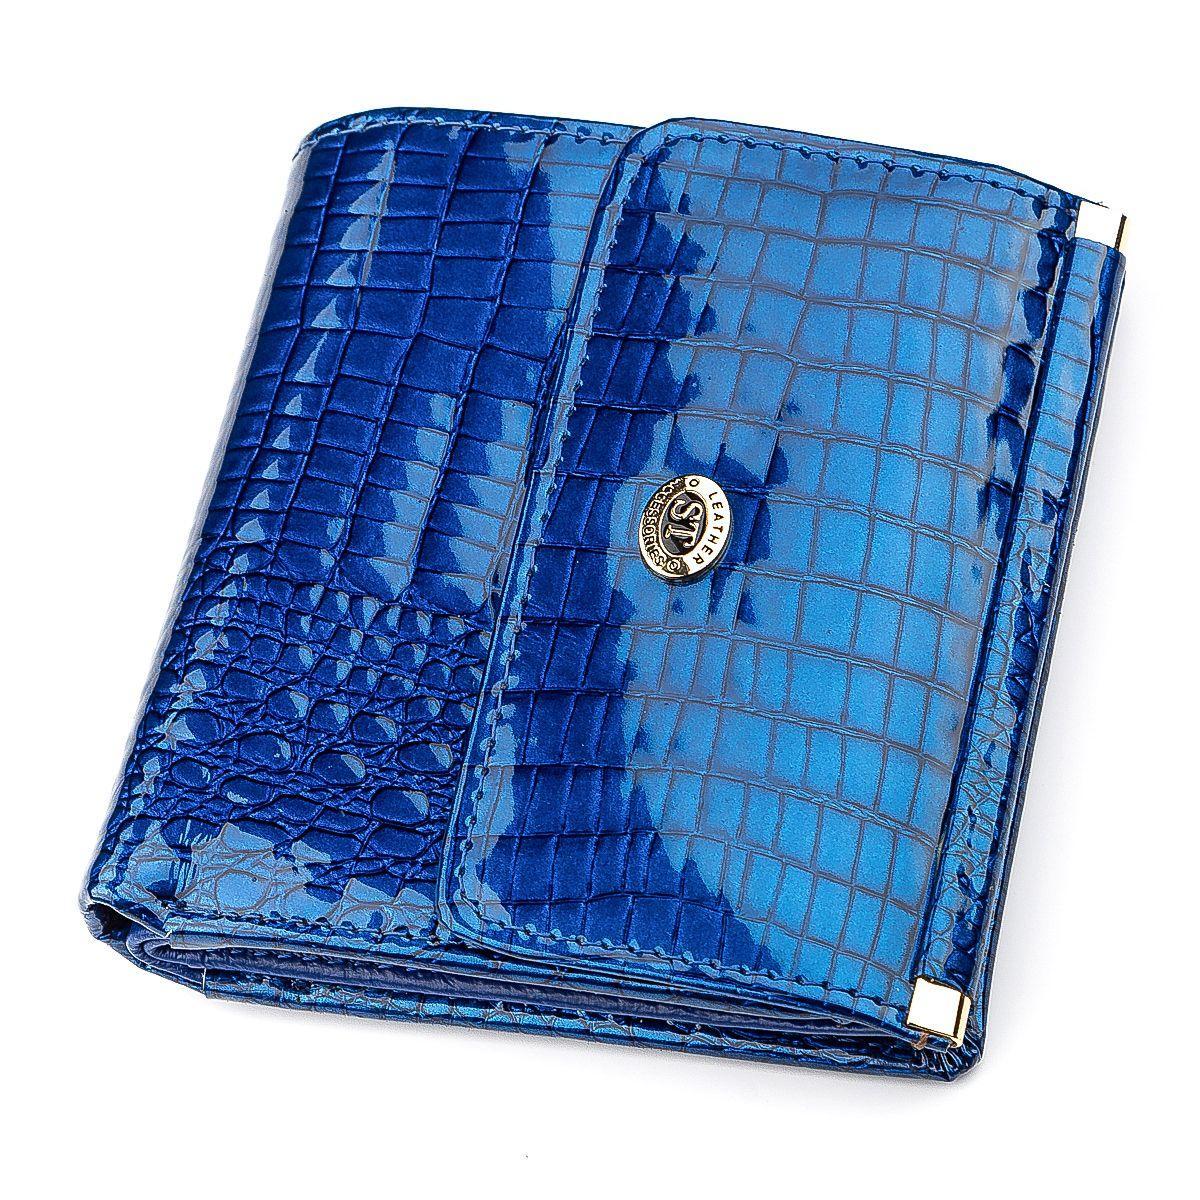 Кошелек женский ST Leather 18356 (S1101A) кожаный Синий, Синий